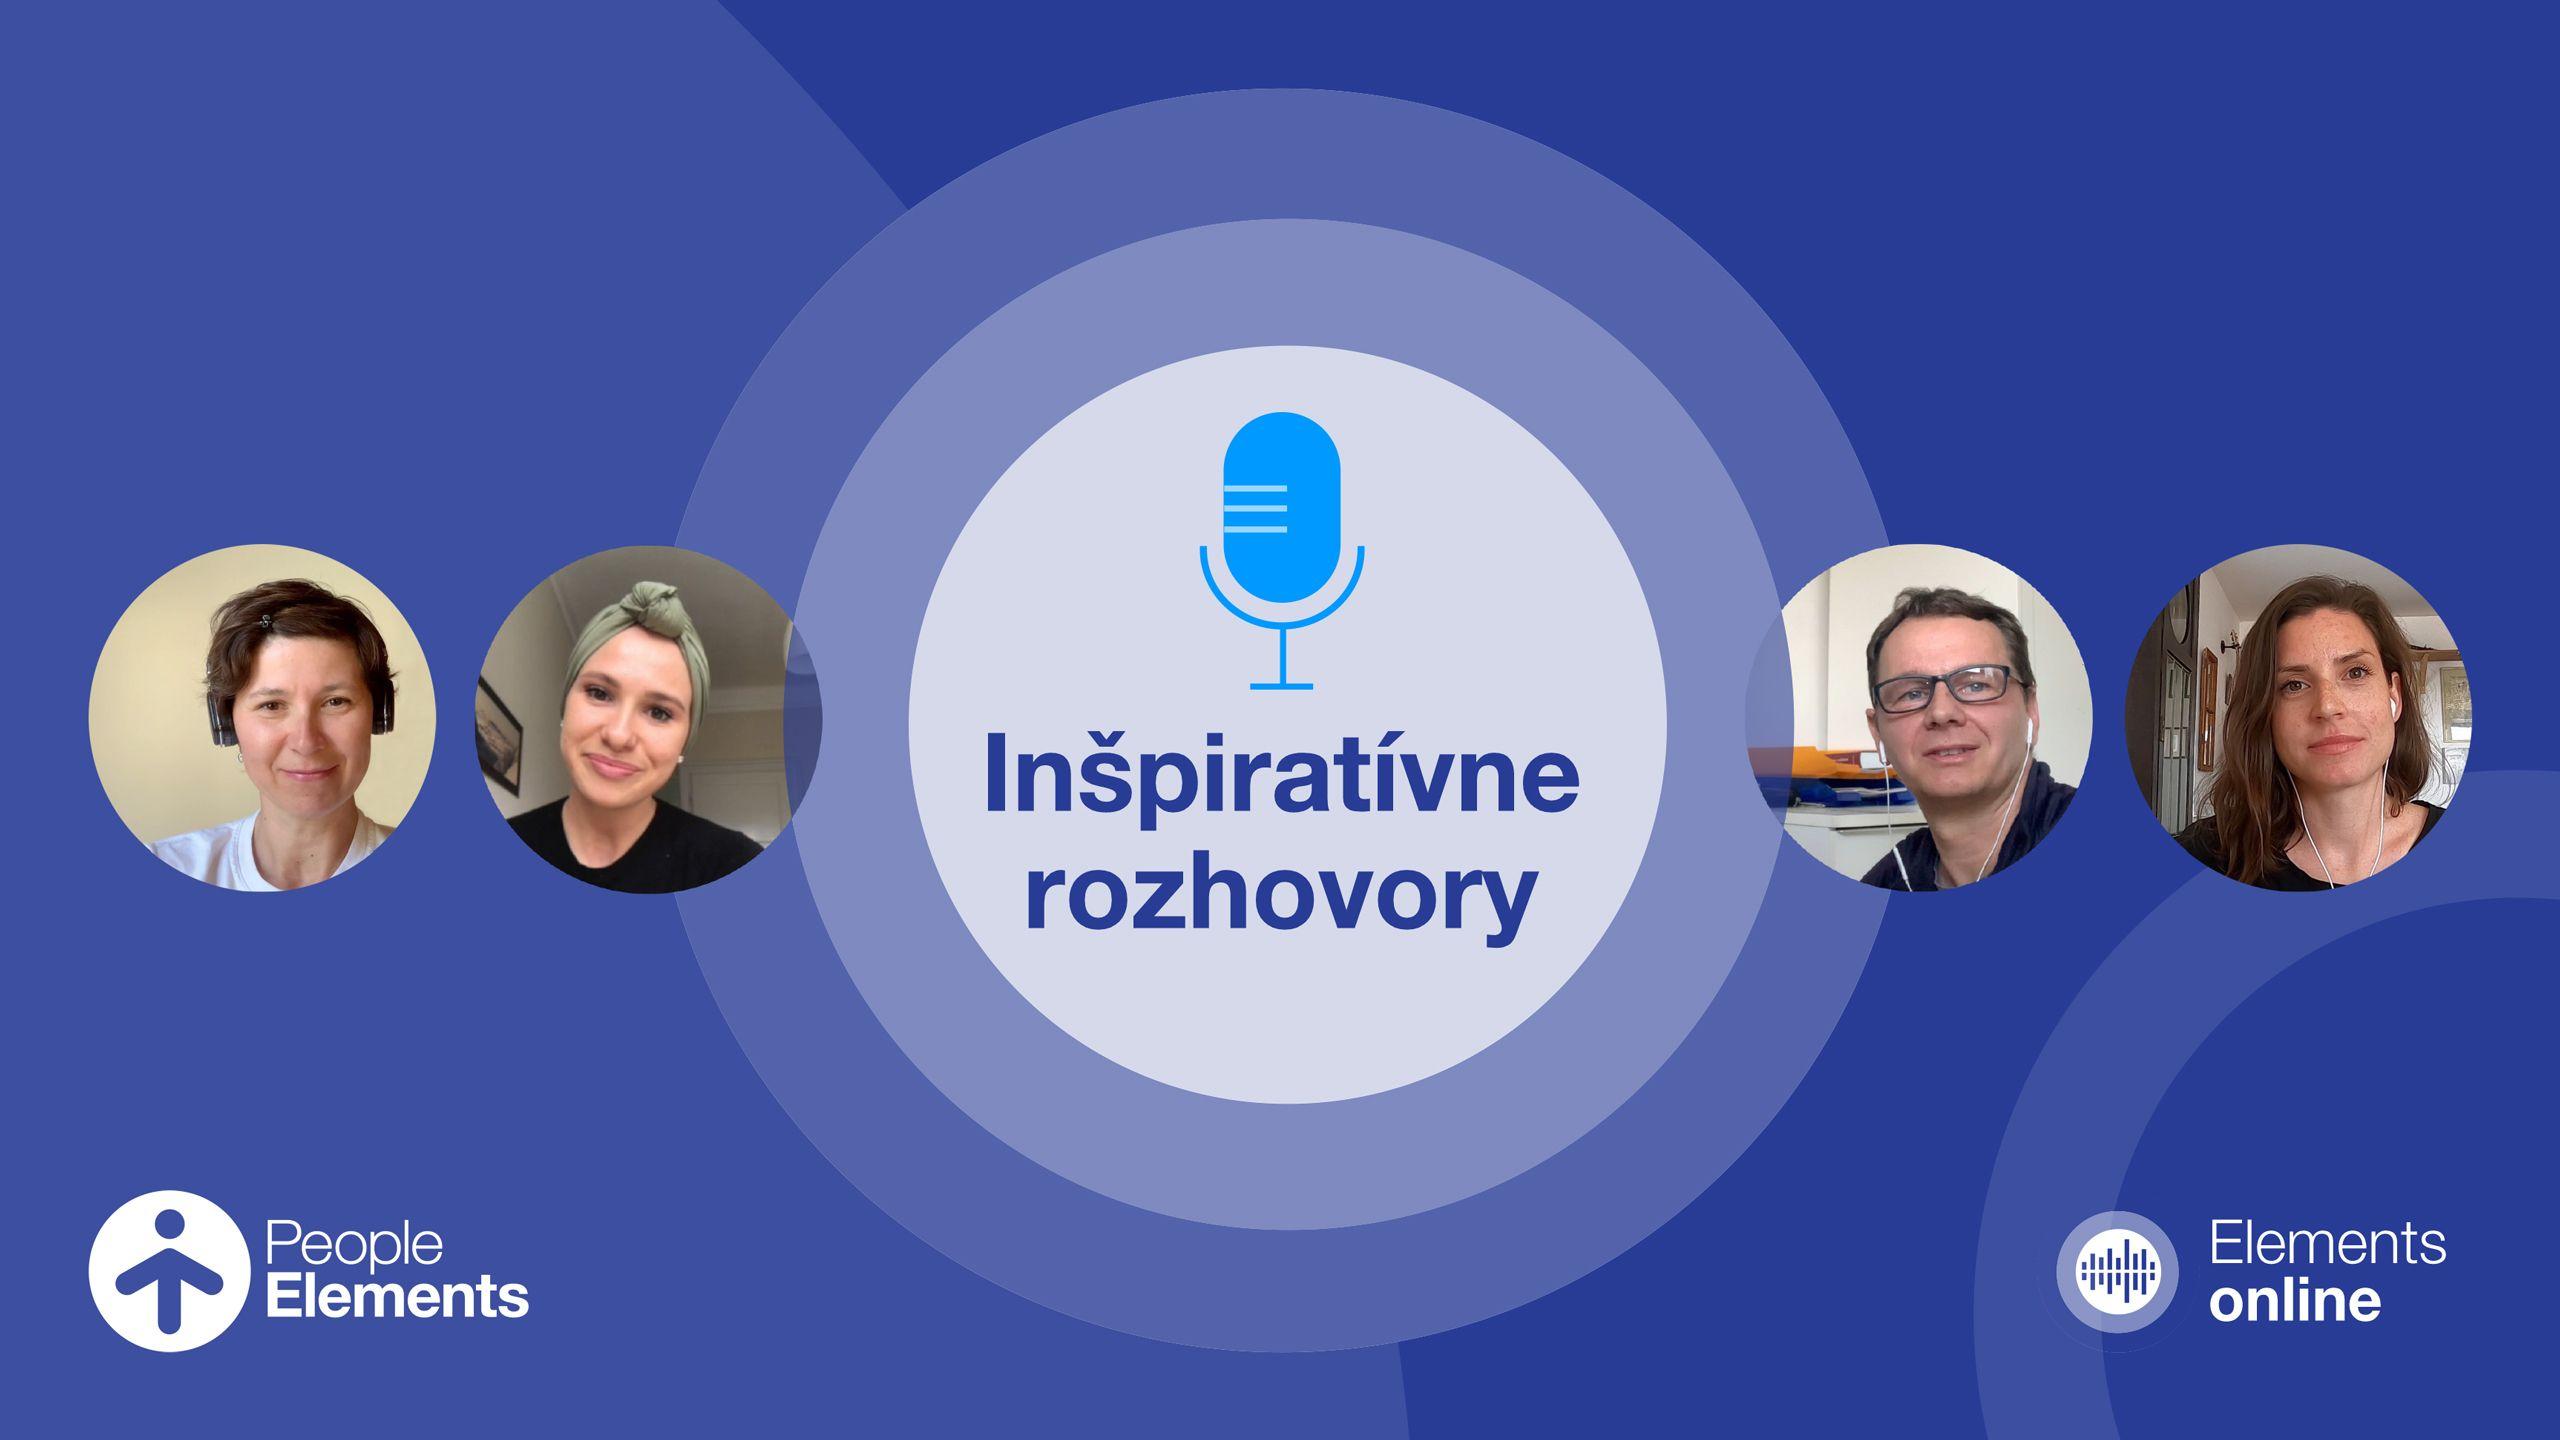 pe-banner-inspirativne-rozhovory-2020-07-27-1920x1080@2x-c